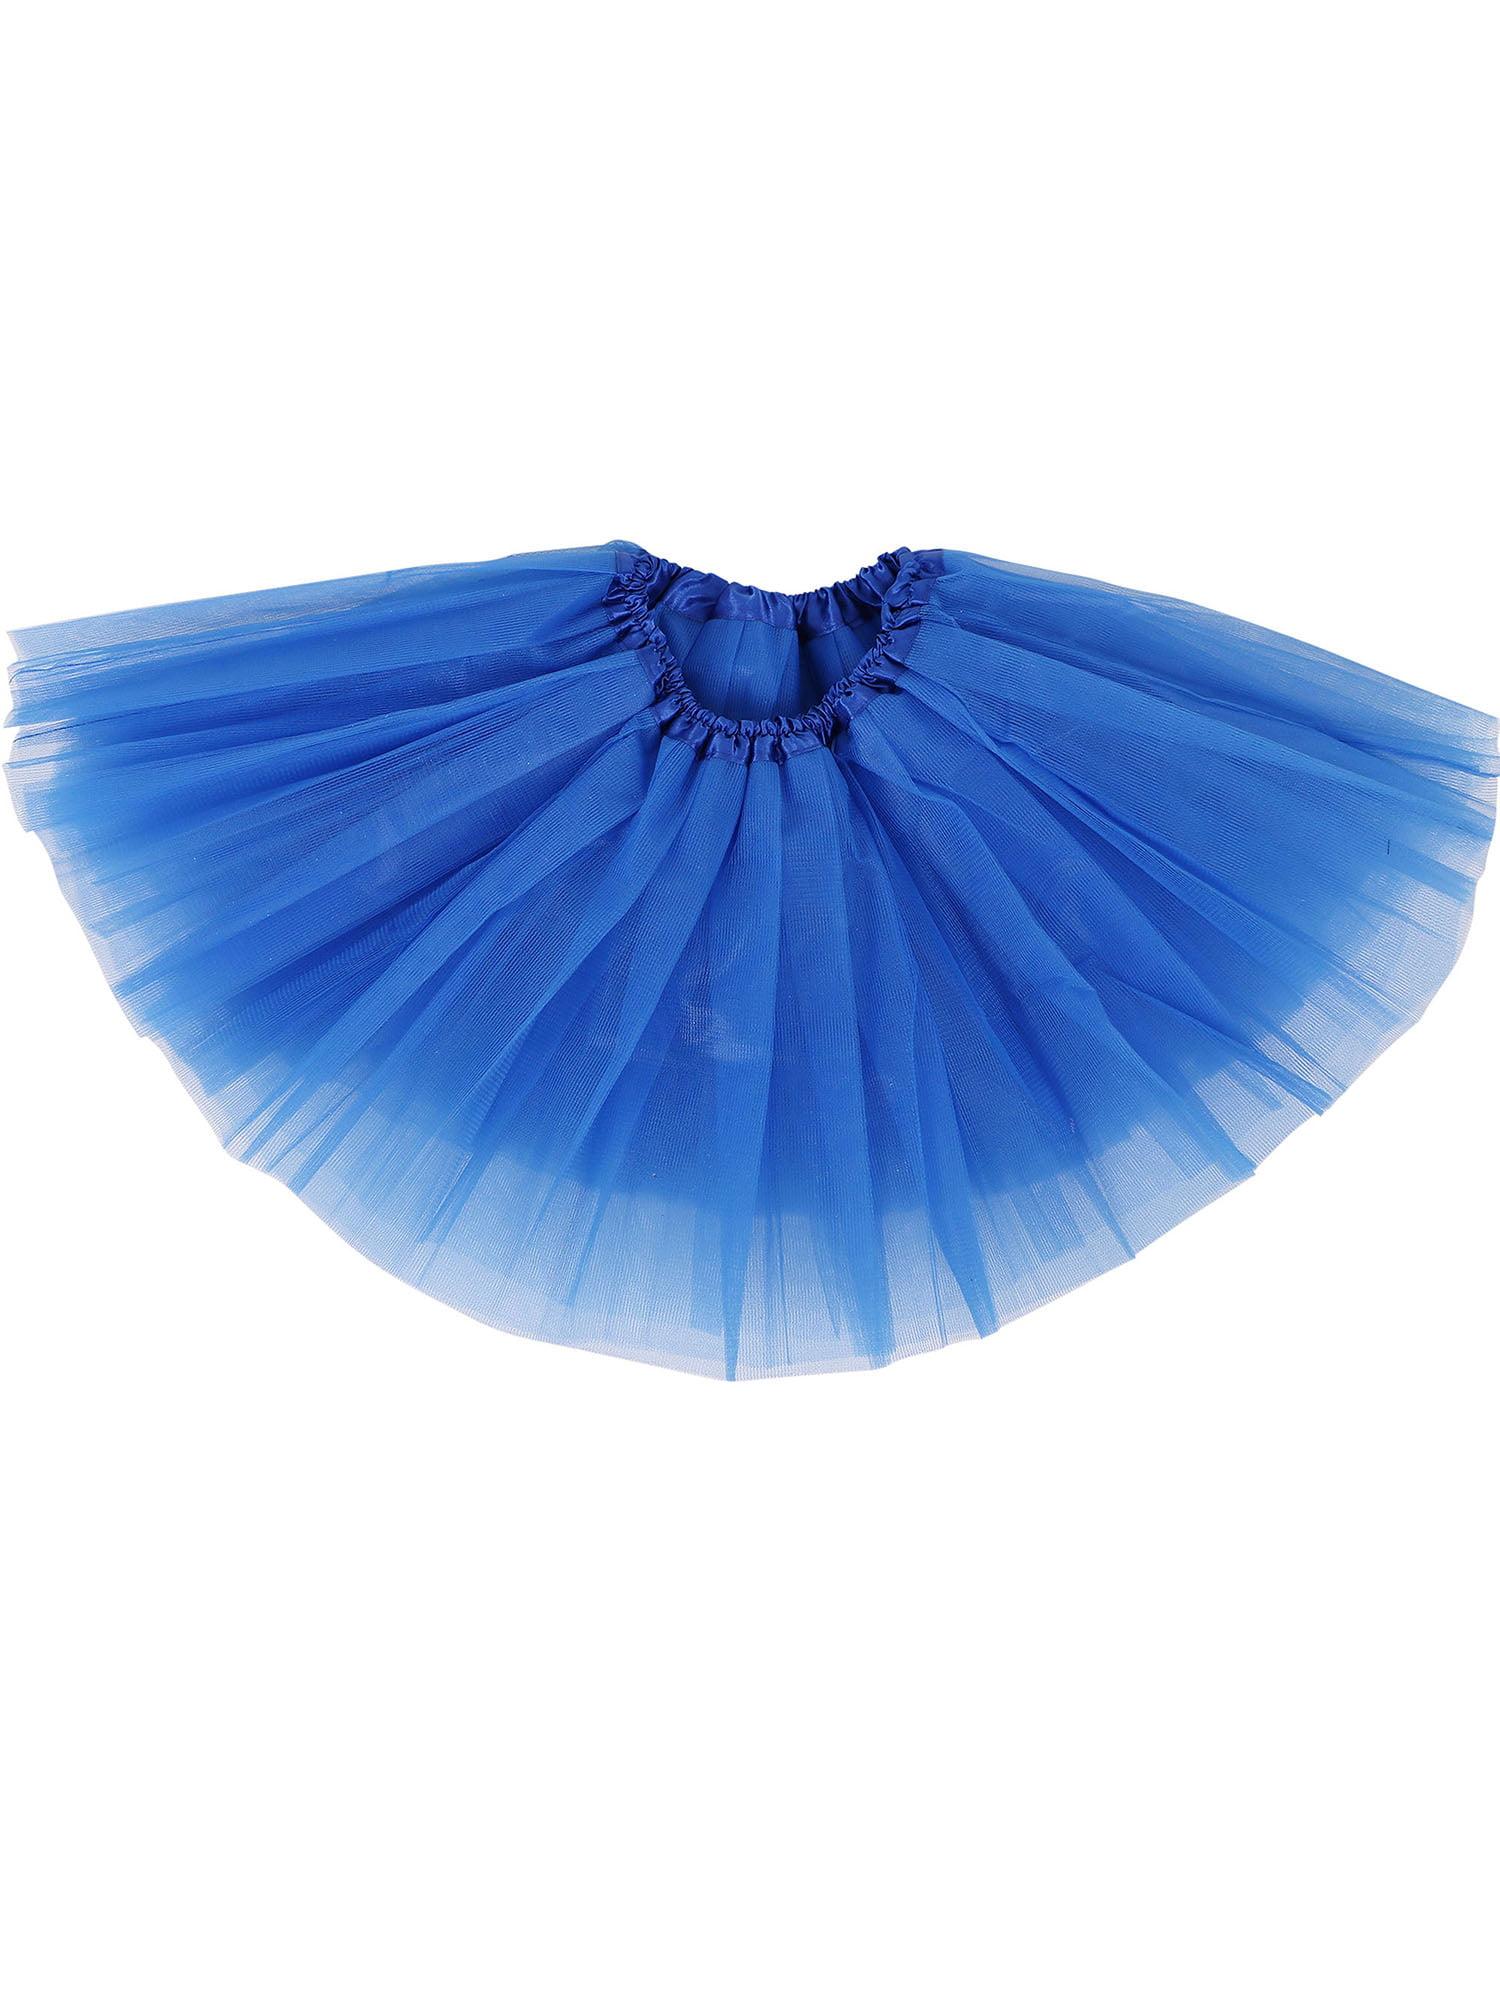 Girl Princess Tulle Tutu Skirt Leopard print Kids Ballet Dance Party Mini Dress